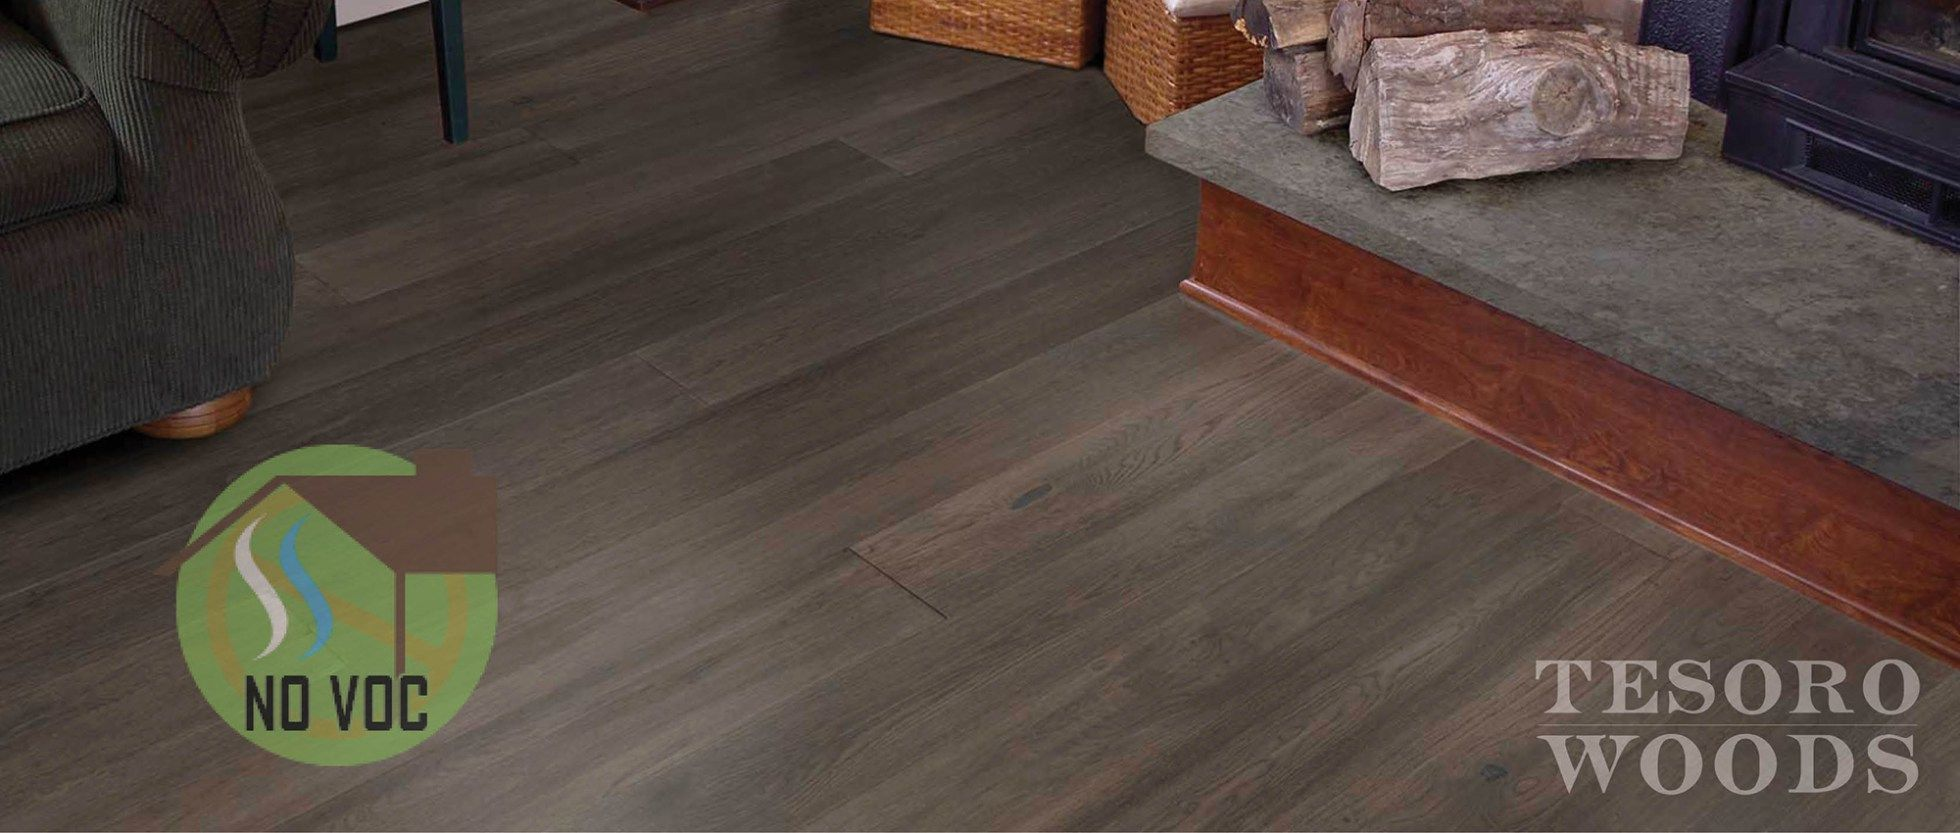 Vocs In Flooring Flooring Engineered Wood Floors Vocs